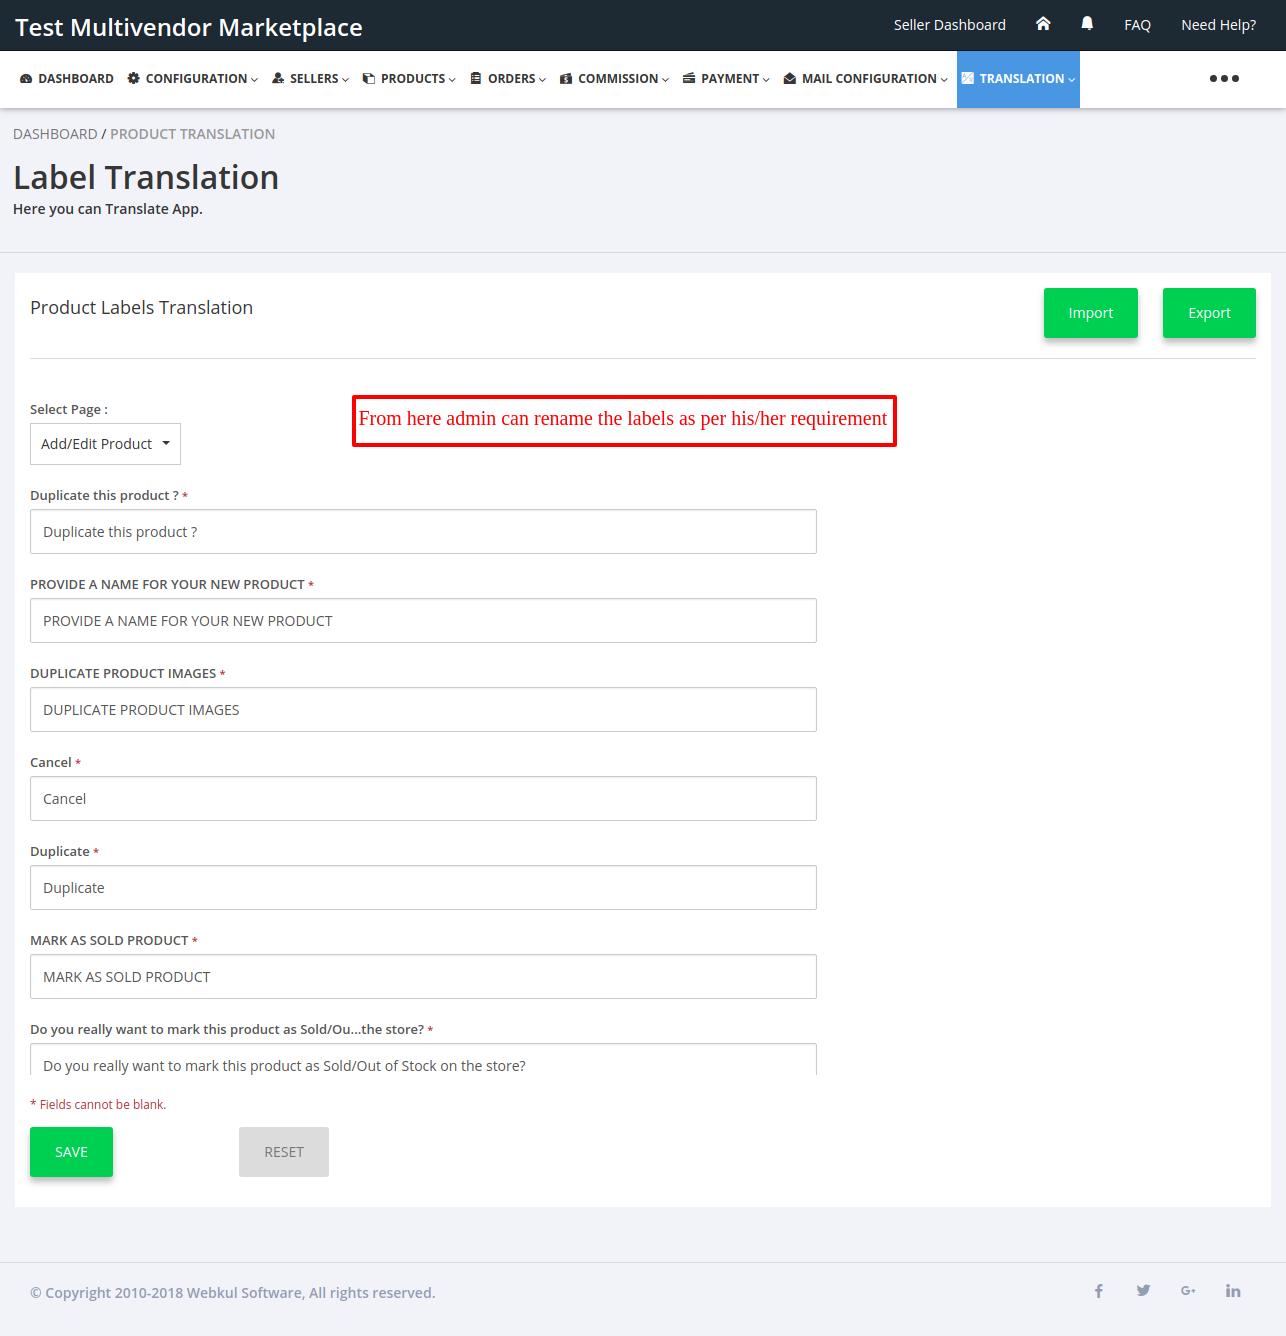 Label Translation Multivendor Marketplace for Shopify by Webkul